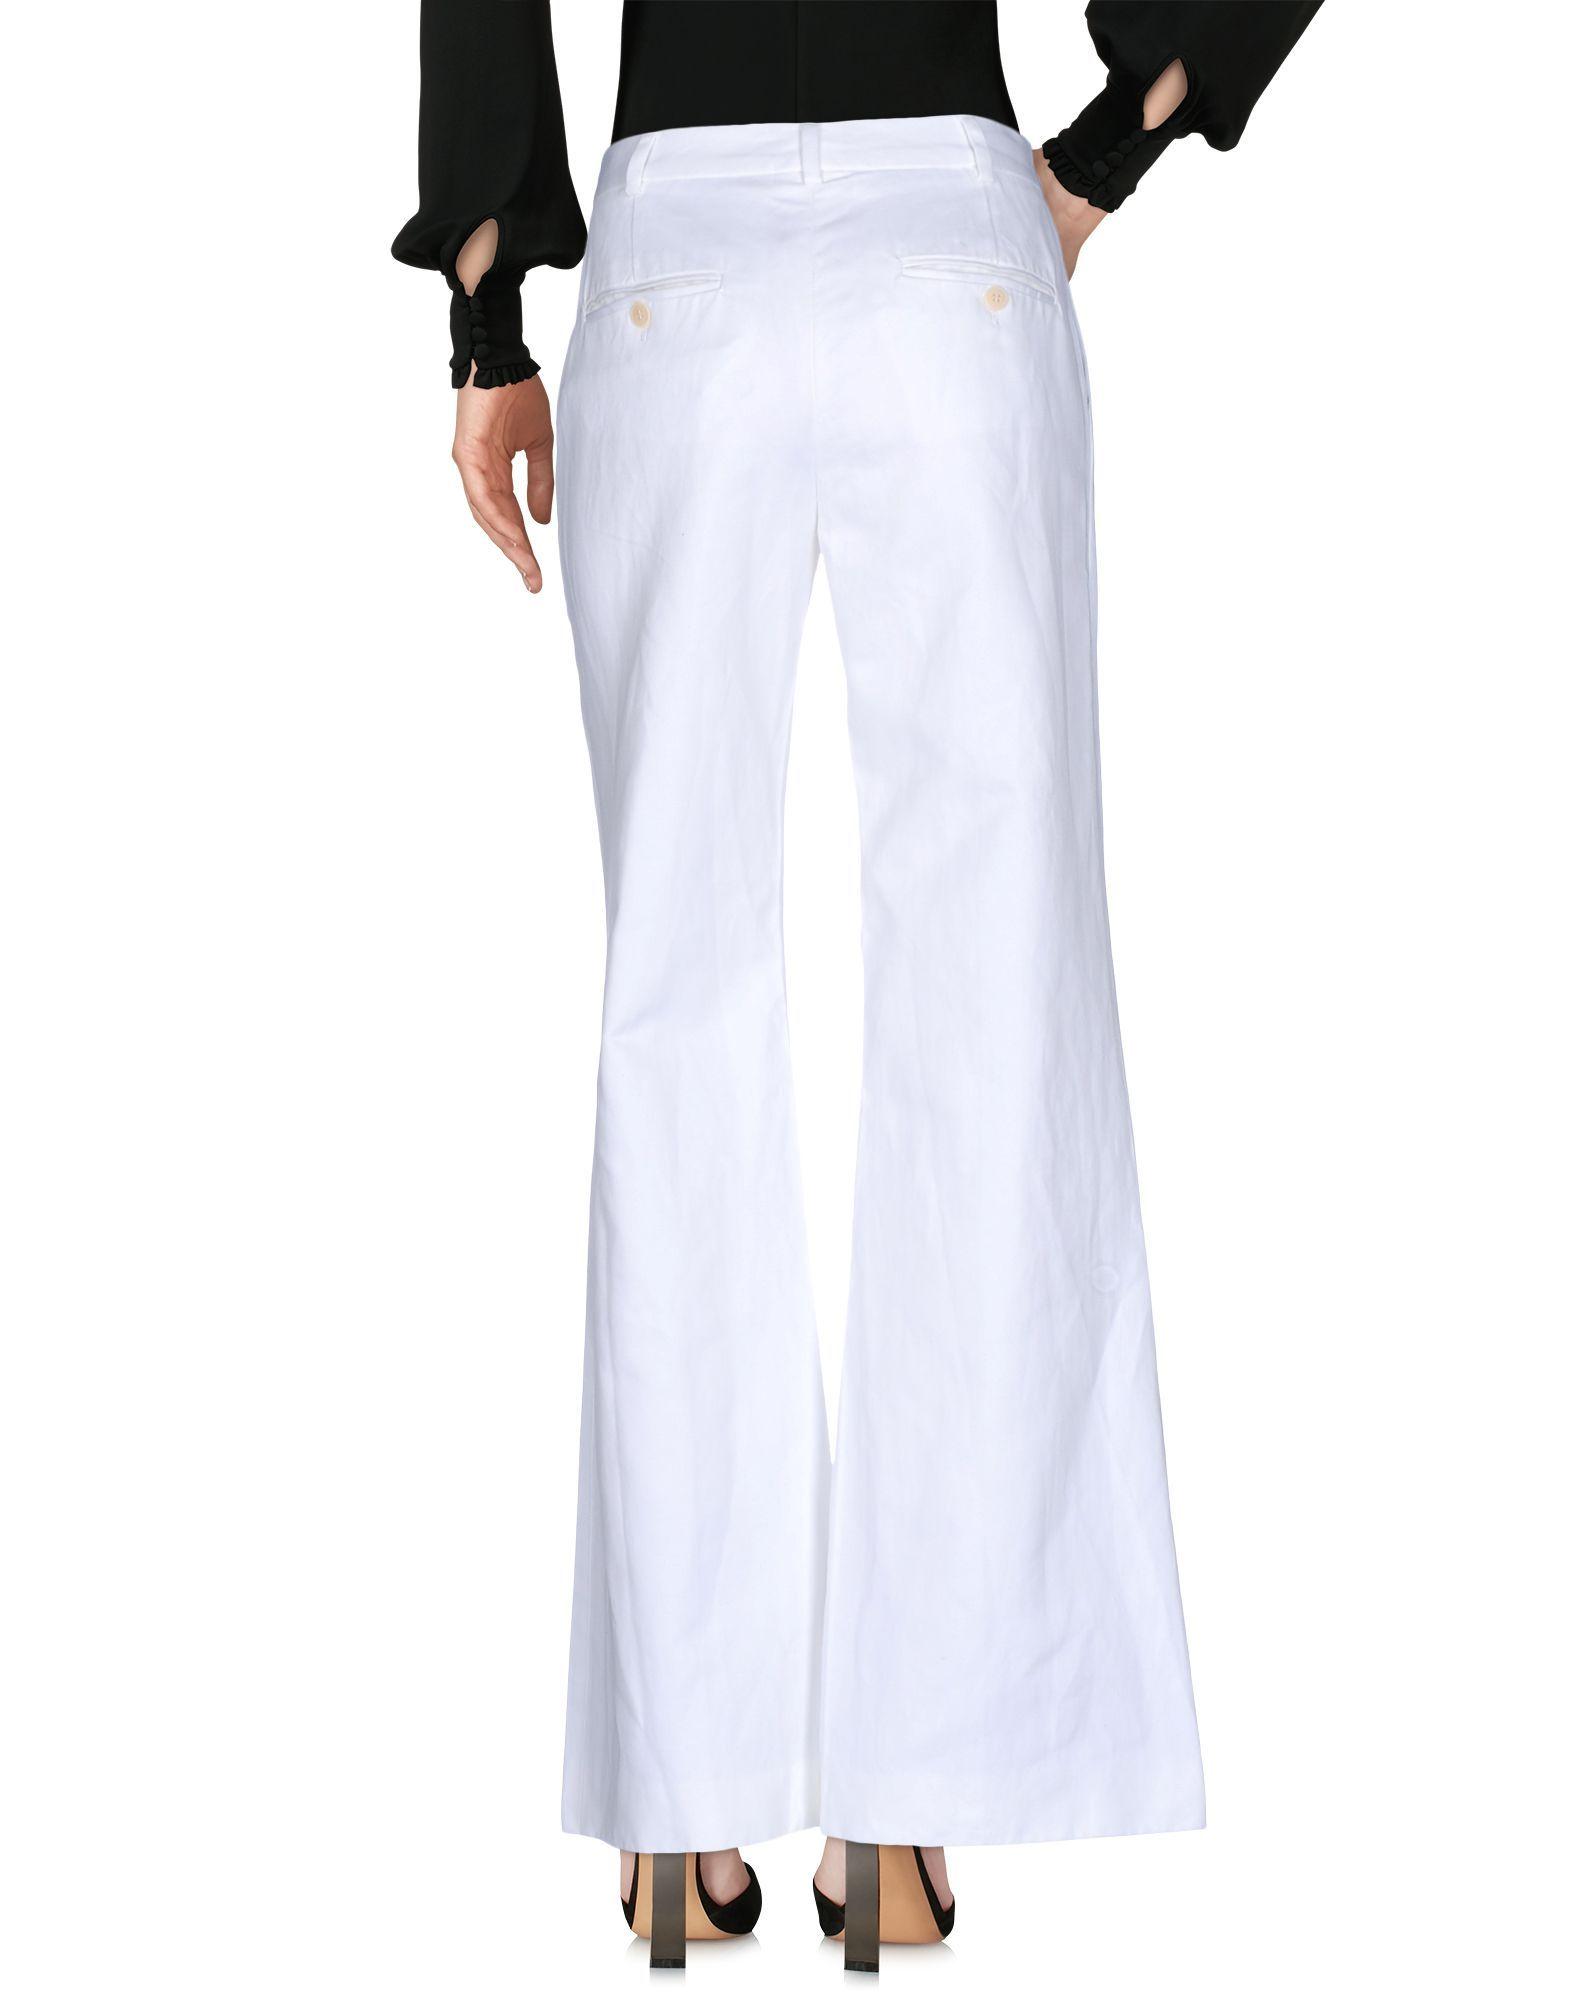 Boule De Neige White Cotton Wide Leg Trousers